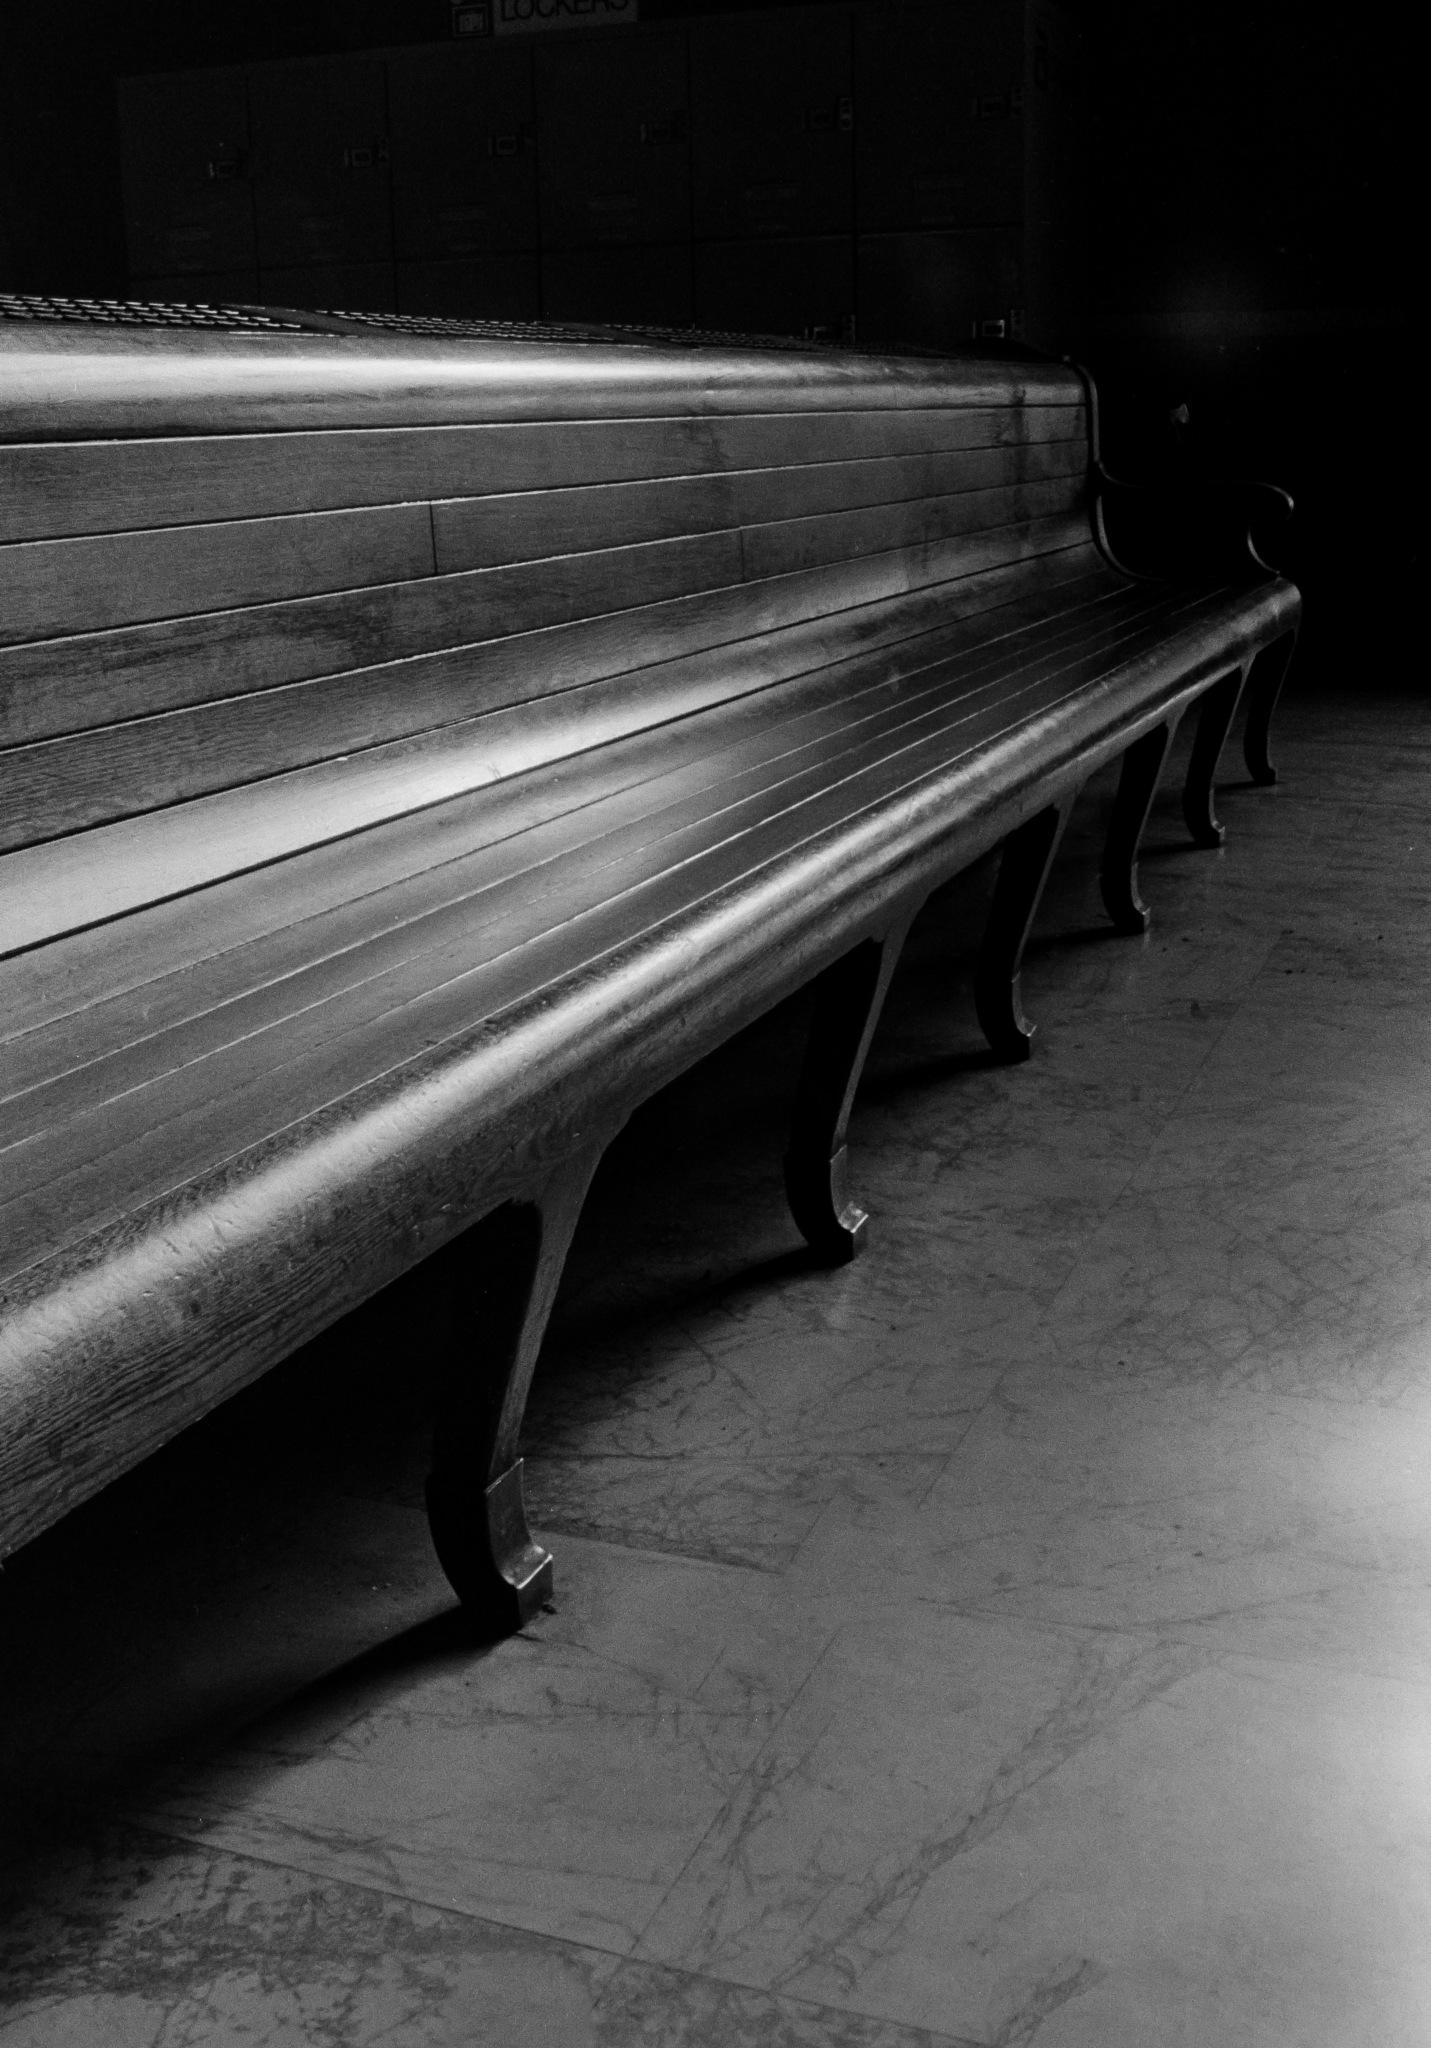 Train Station Bench by Graham Jamie Bush